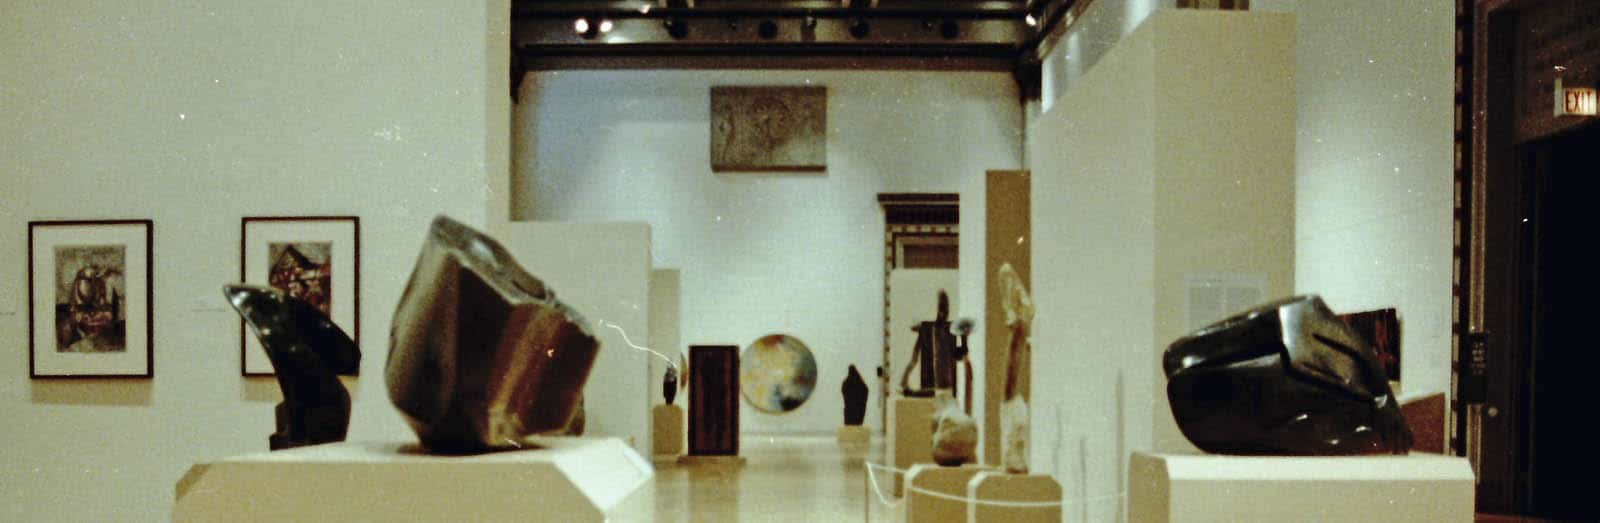 matombo exhibit at african contemporary